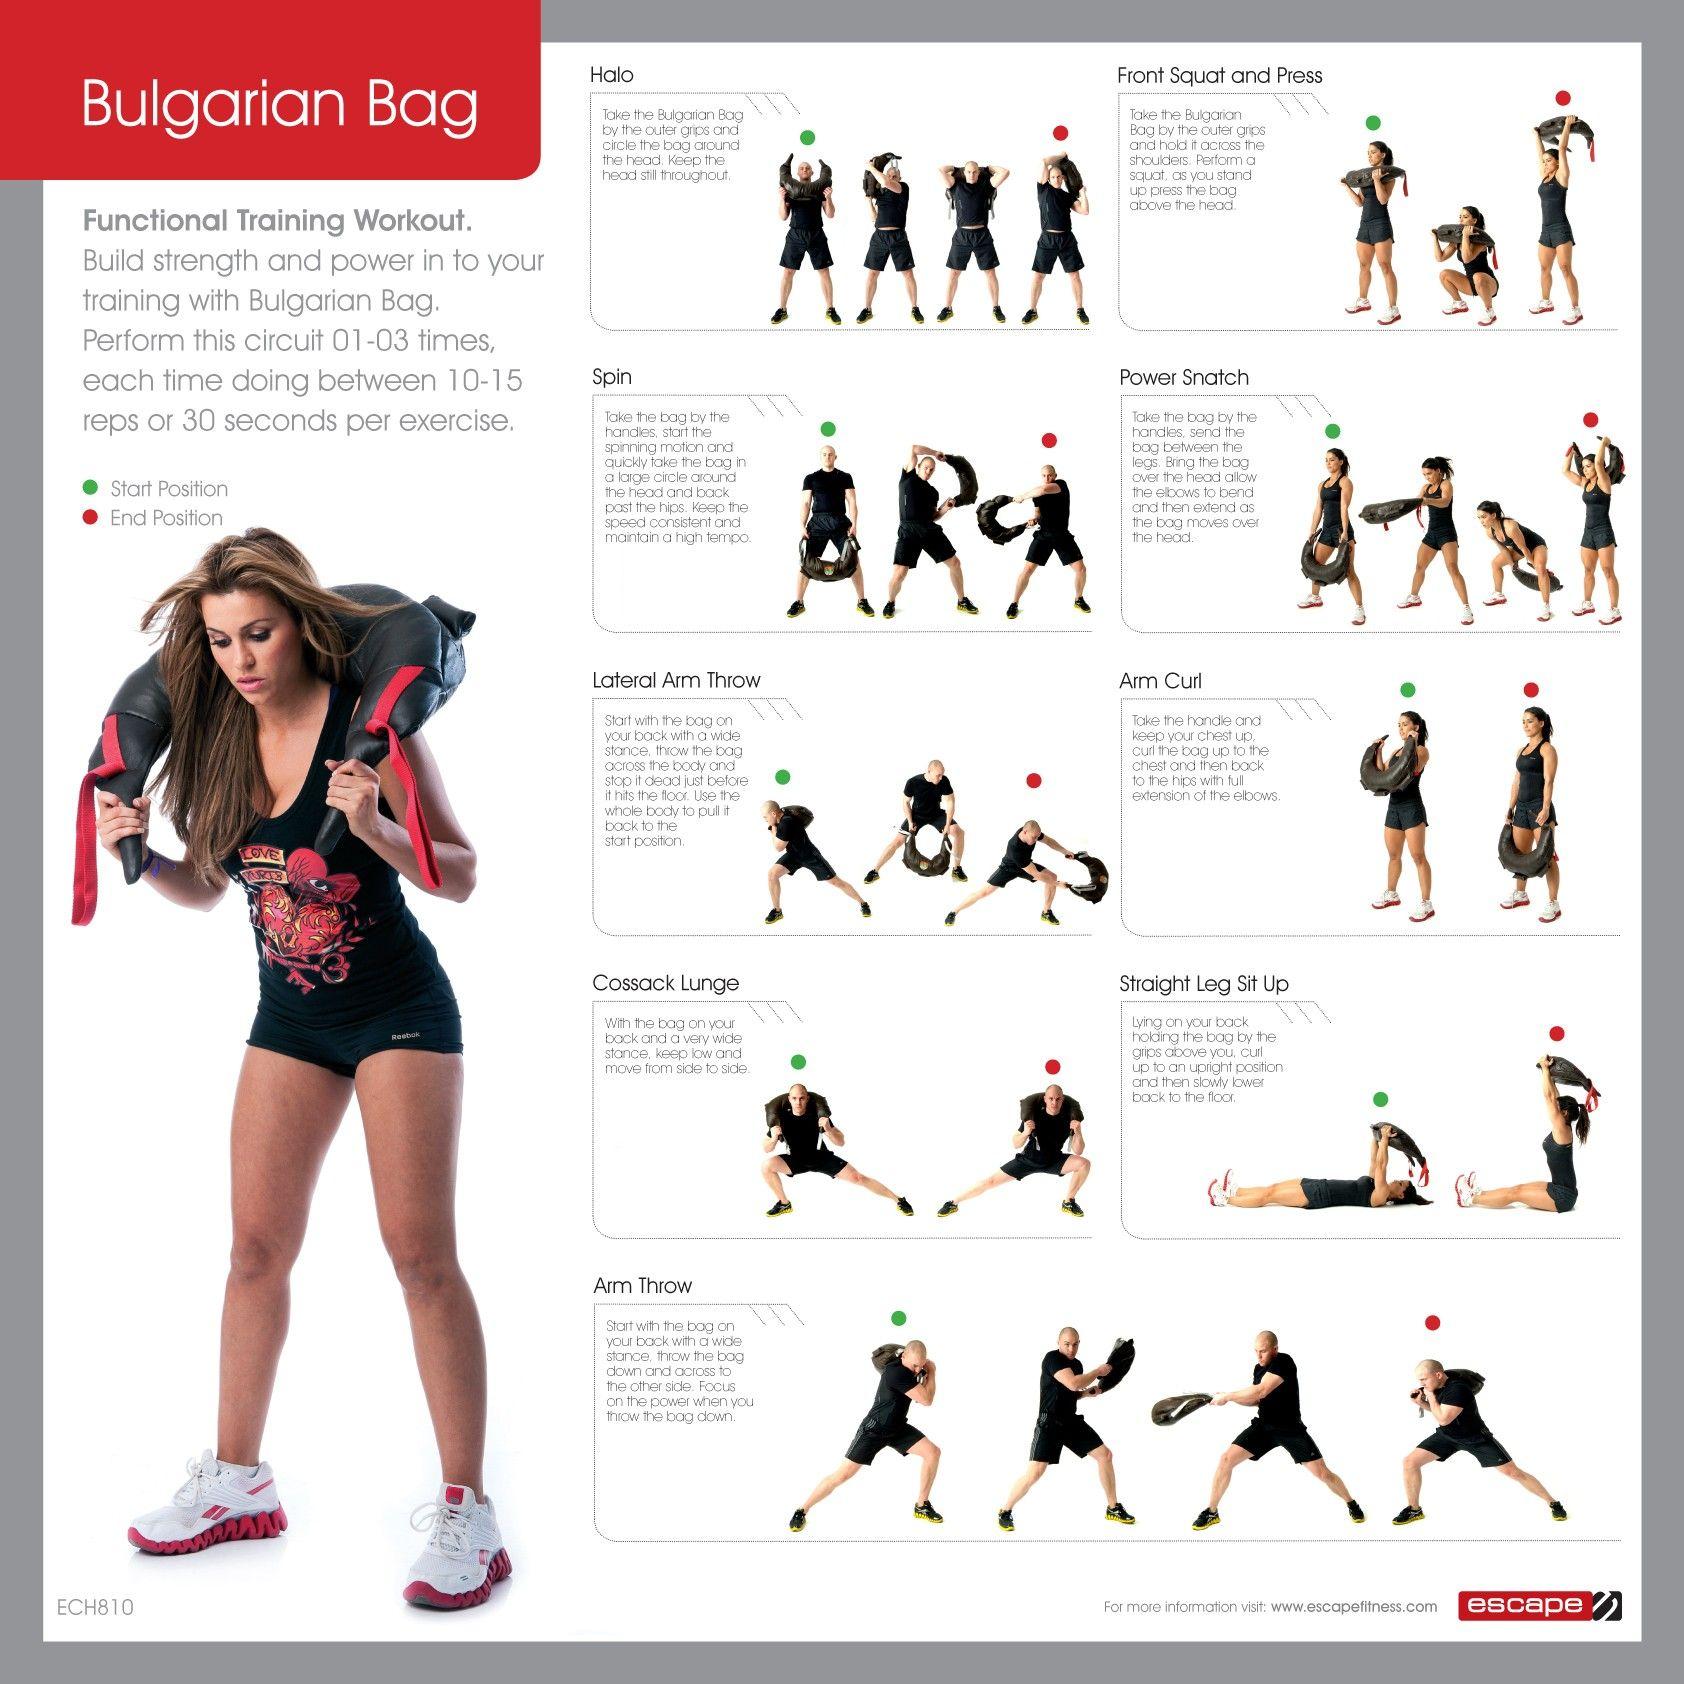 boot camp workout sandbag workout no equipment workout mental training [ 1684 x 1684 Pixel ]